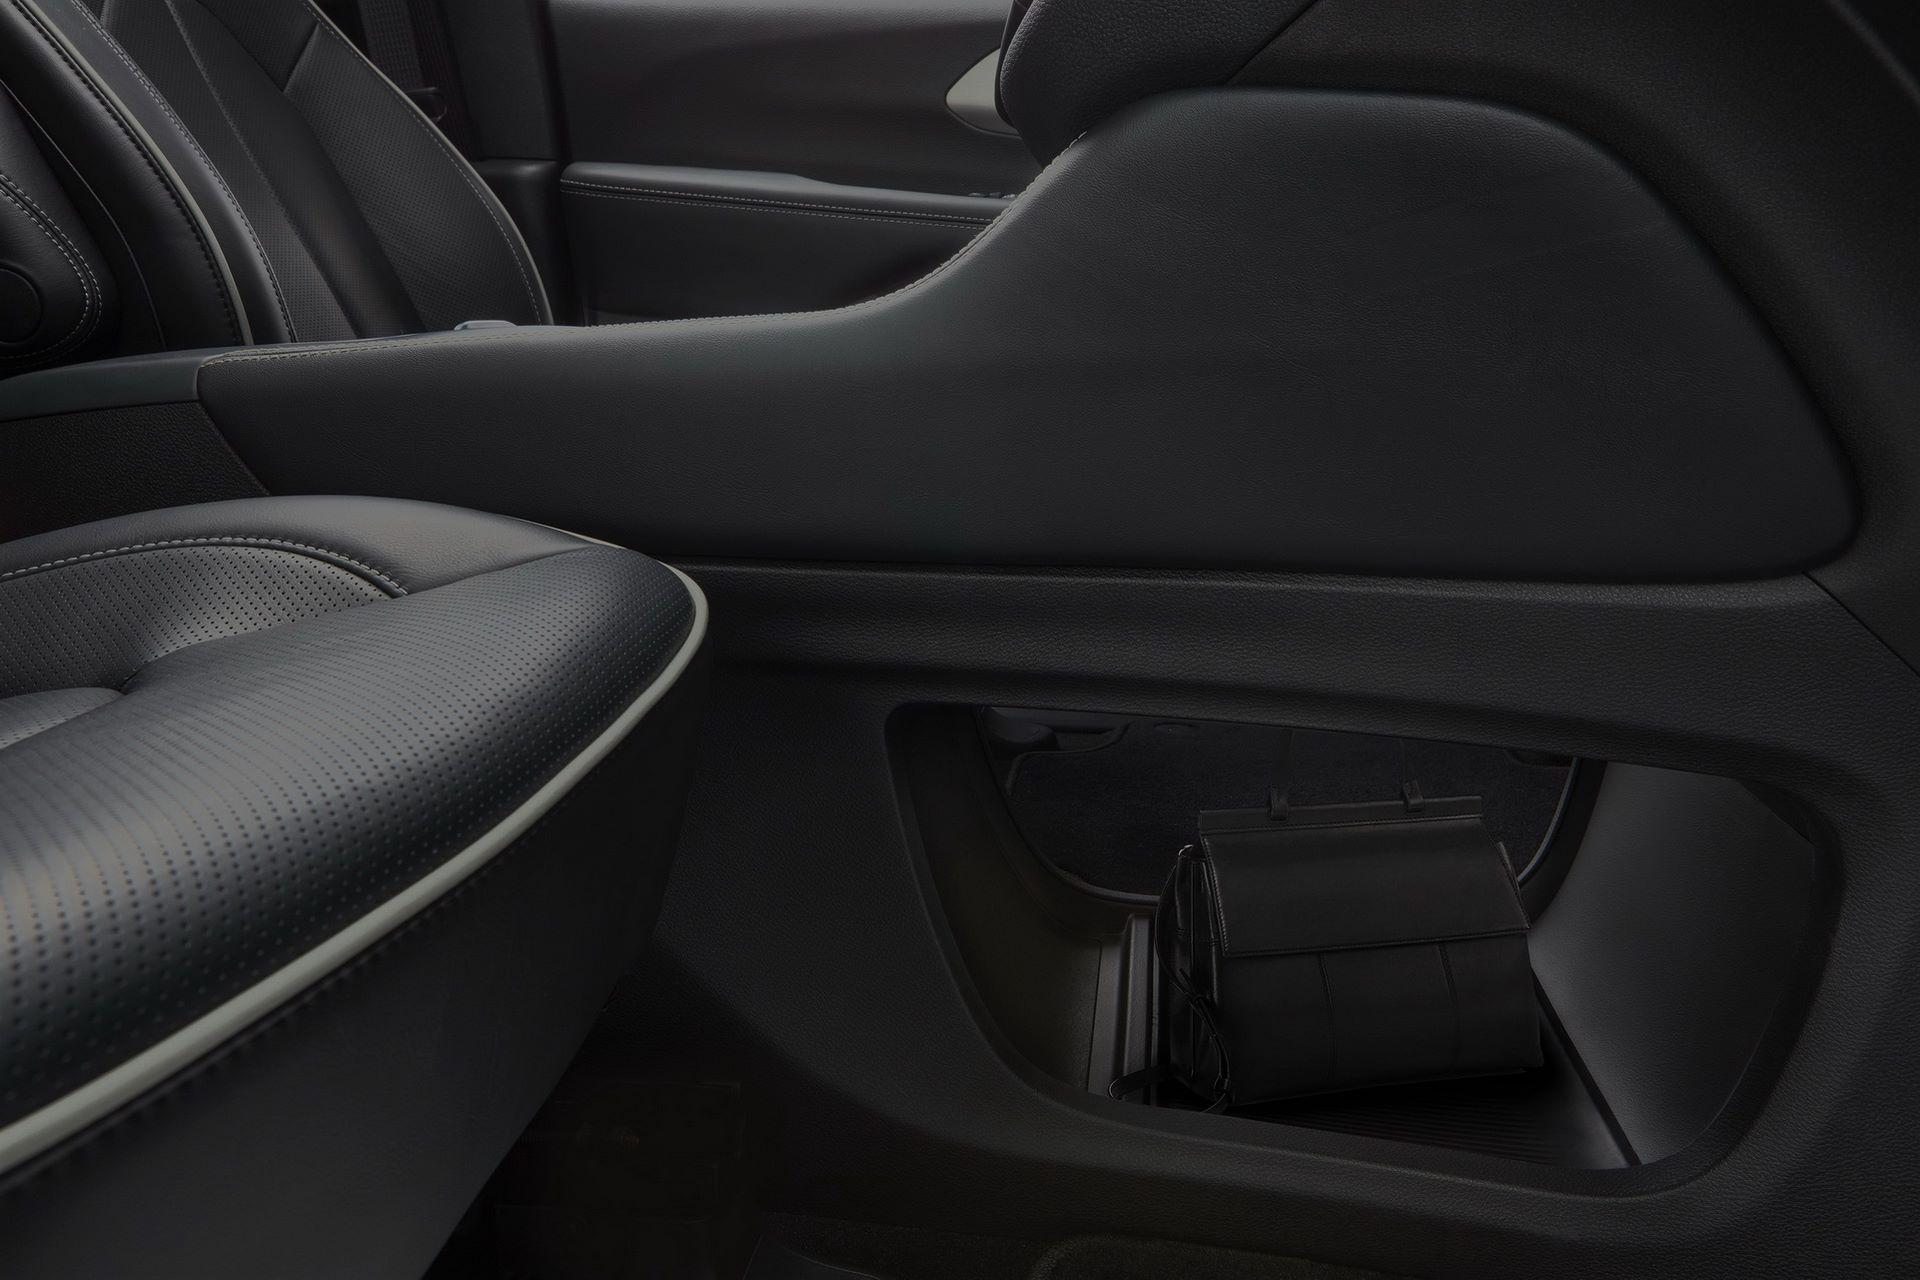 2021-Chrysler-Pacifica-55